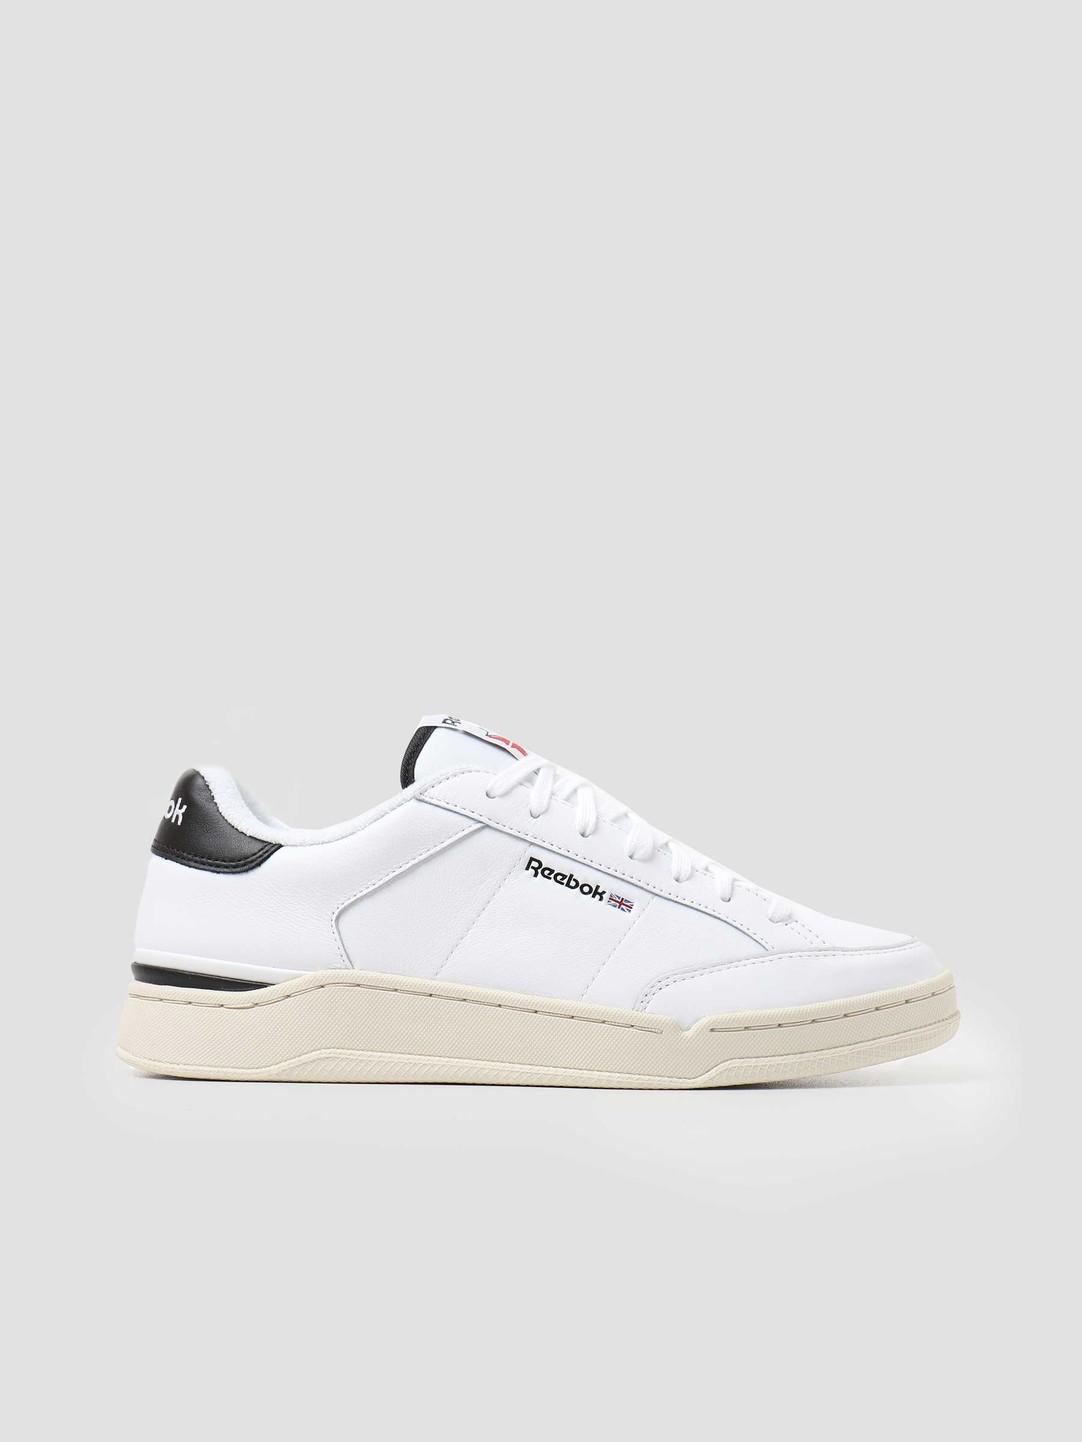 Reebok Reebok Ad Court Footwear White Core Black FX1338